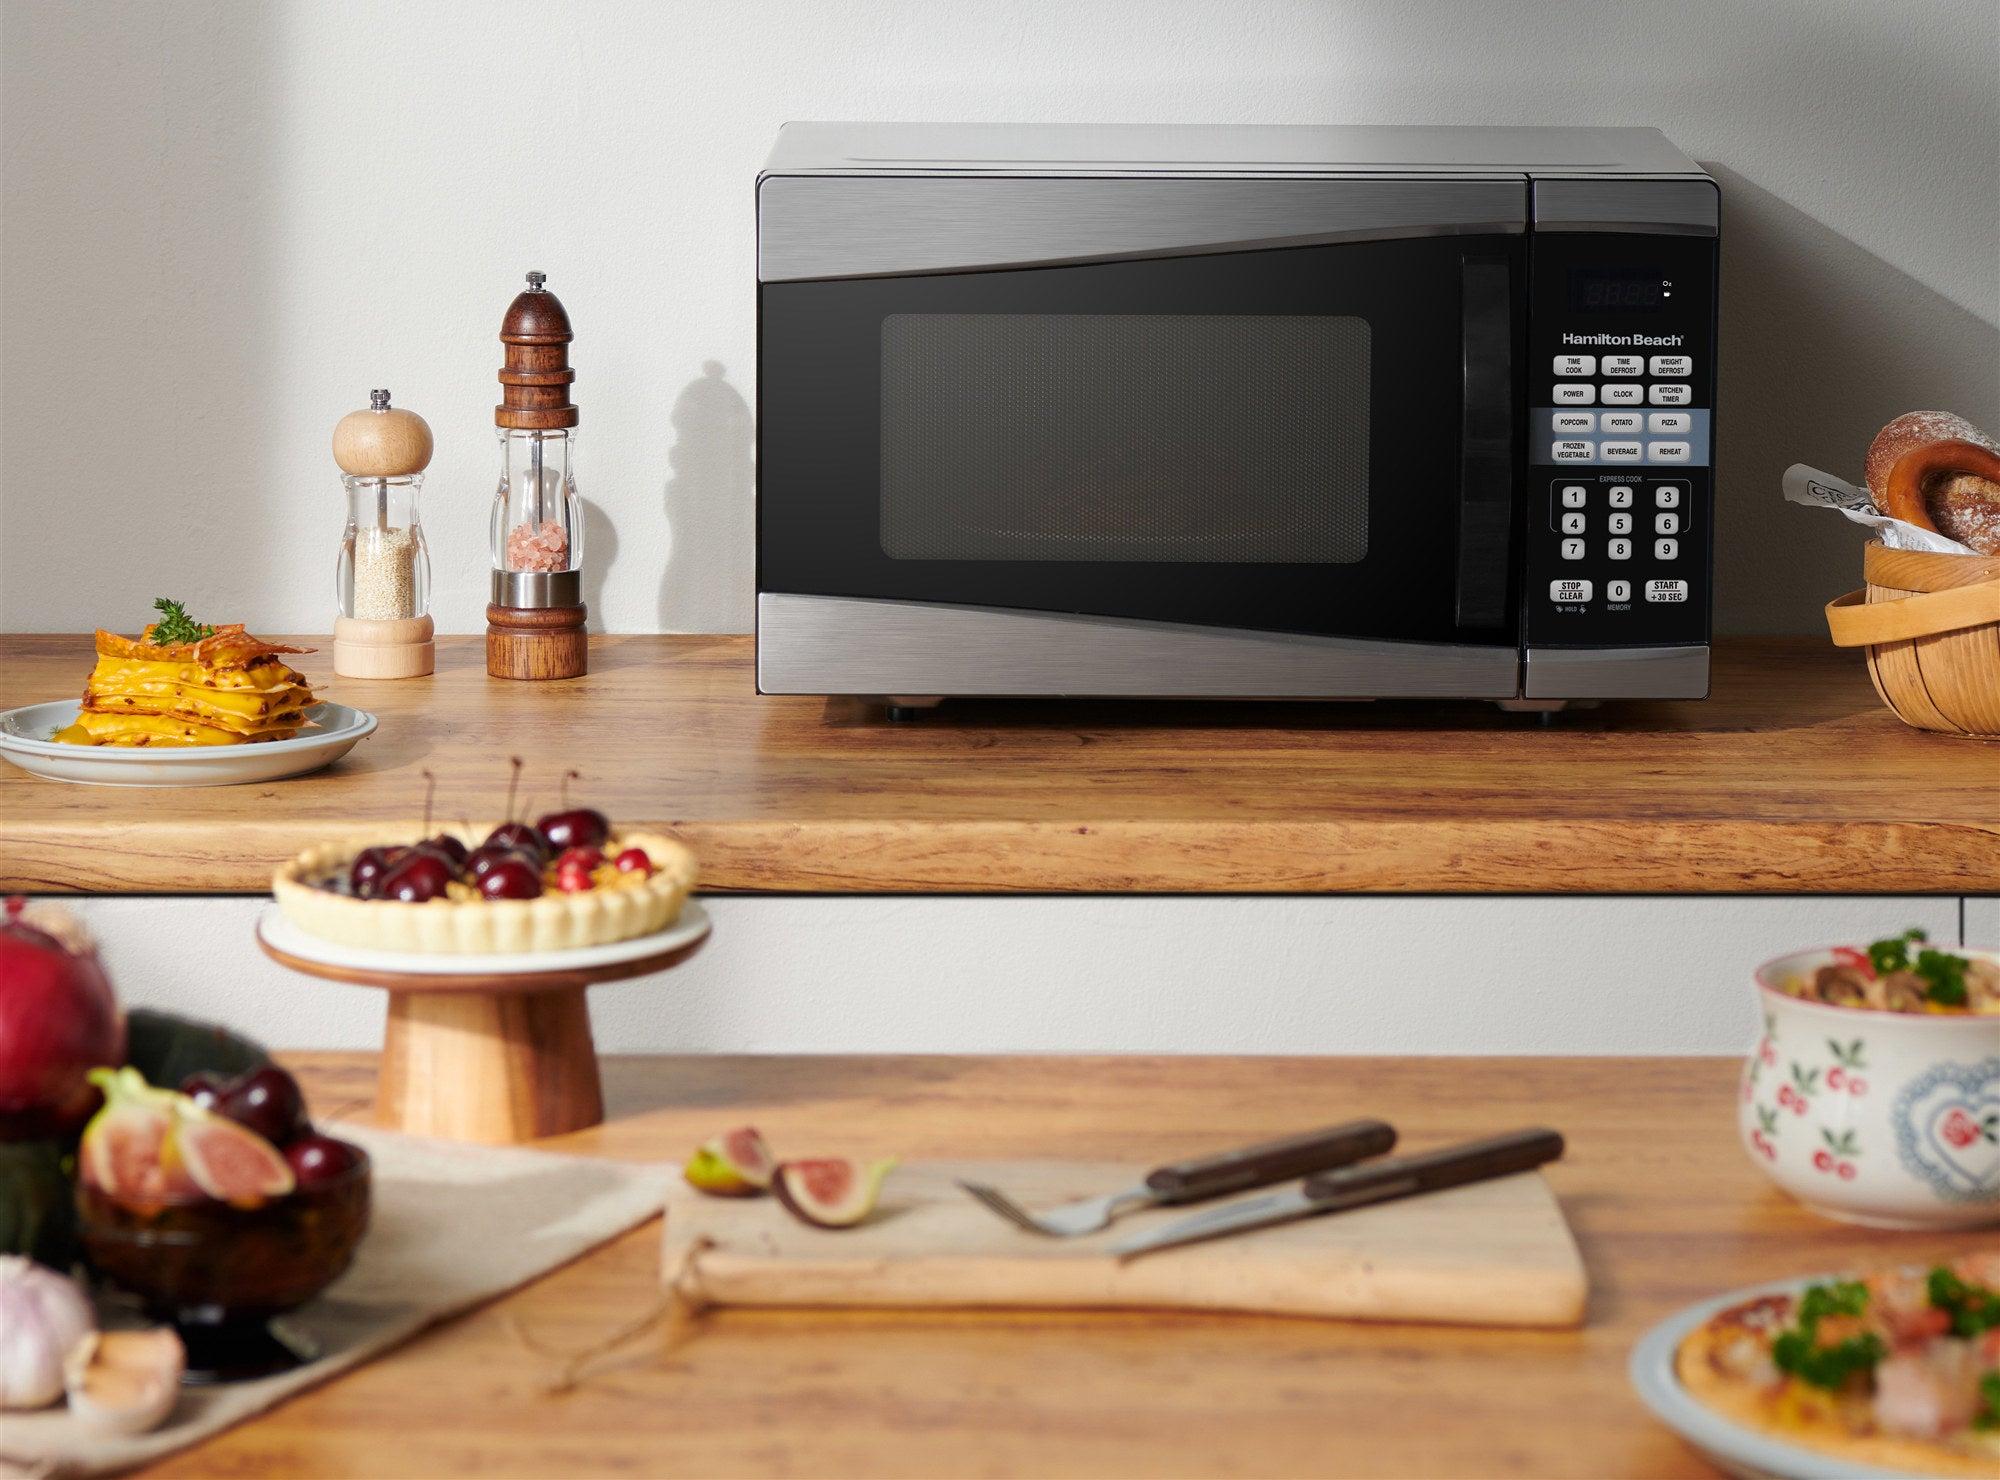 black hamilton beach microwave on a kitchen counter top